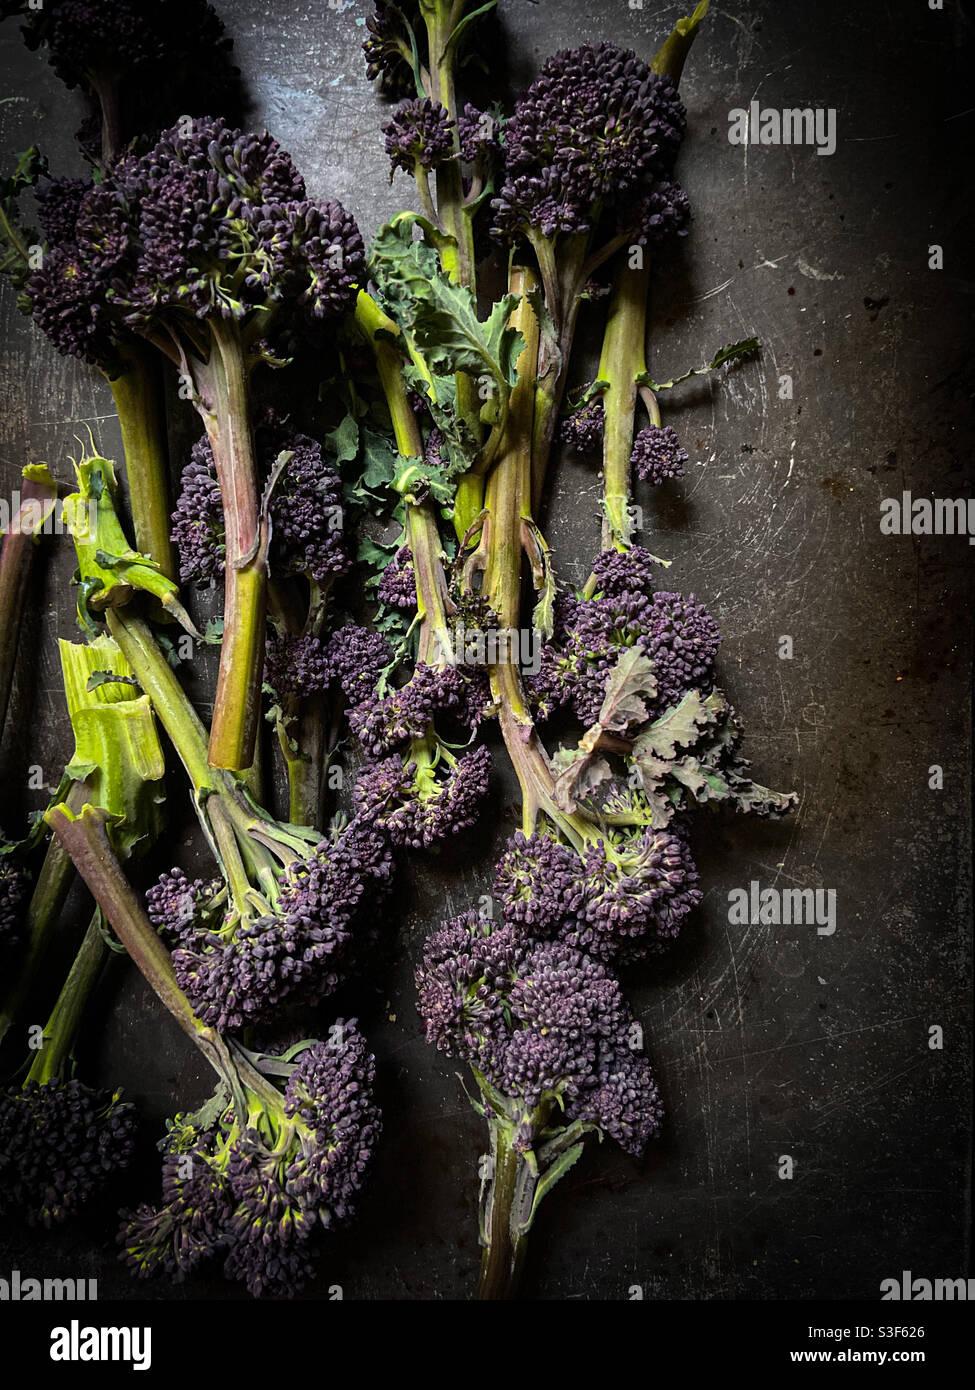 Lila sprießender Brokkoli auf dunklem Hintergrund Stockfoto